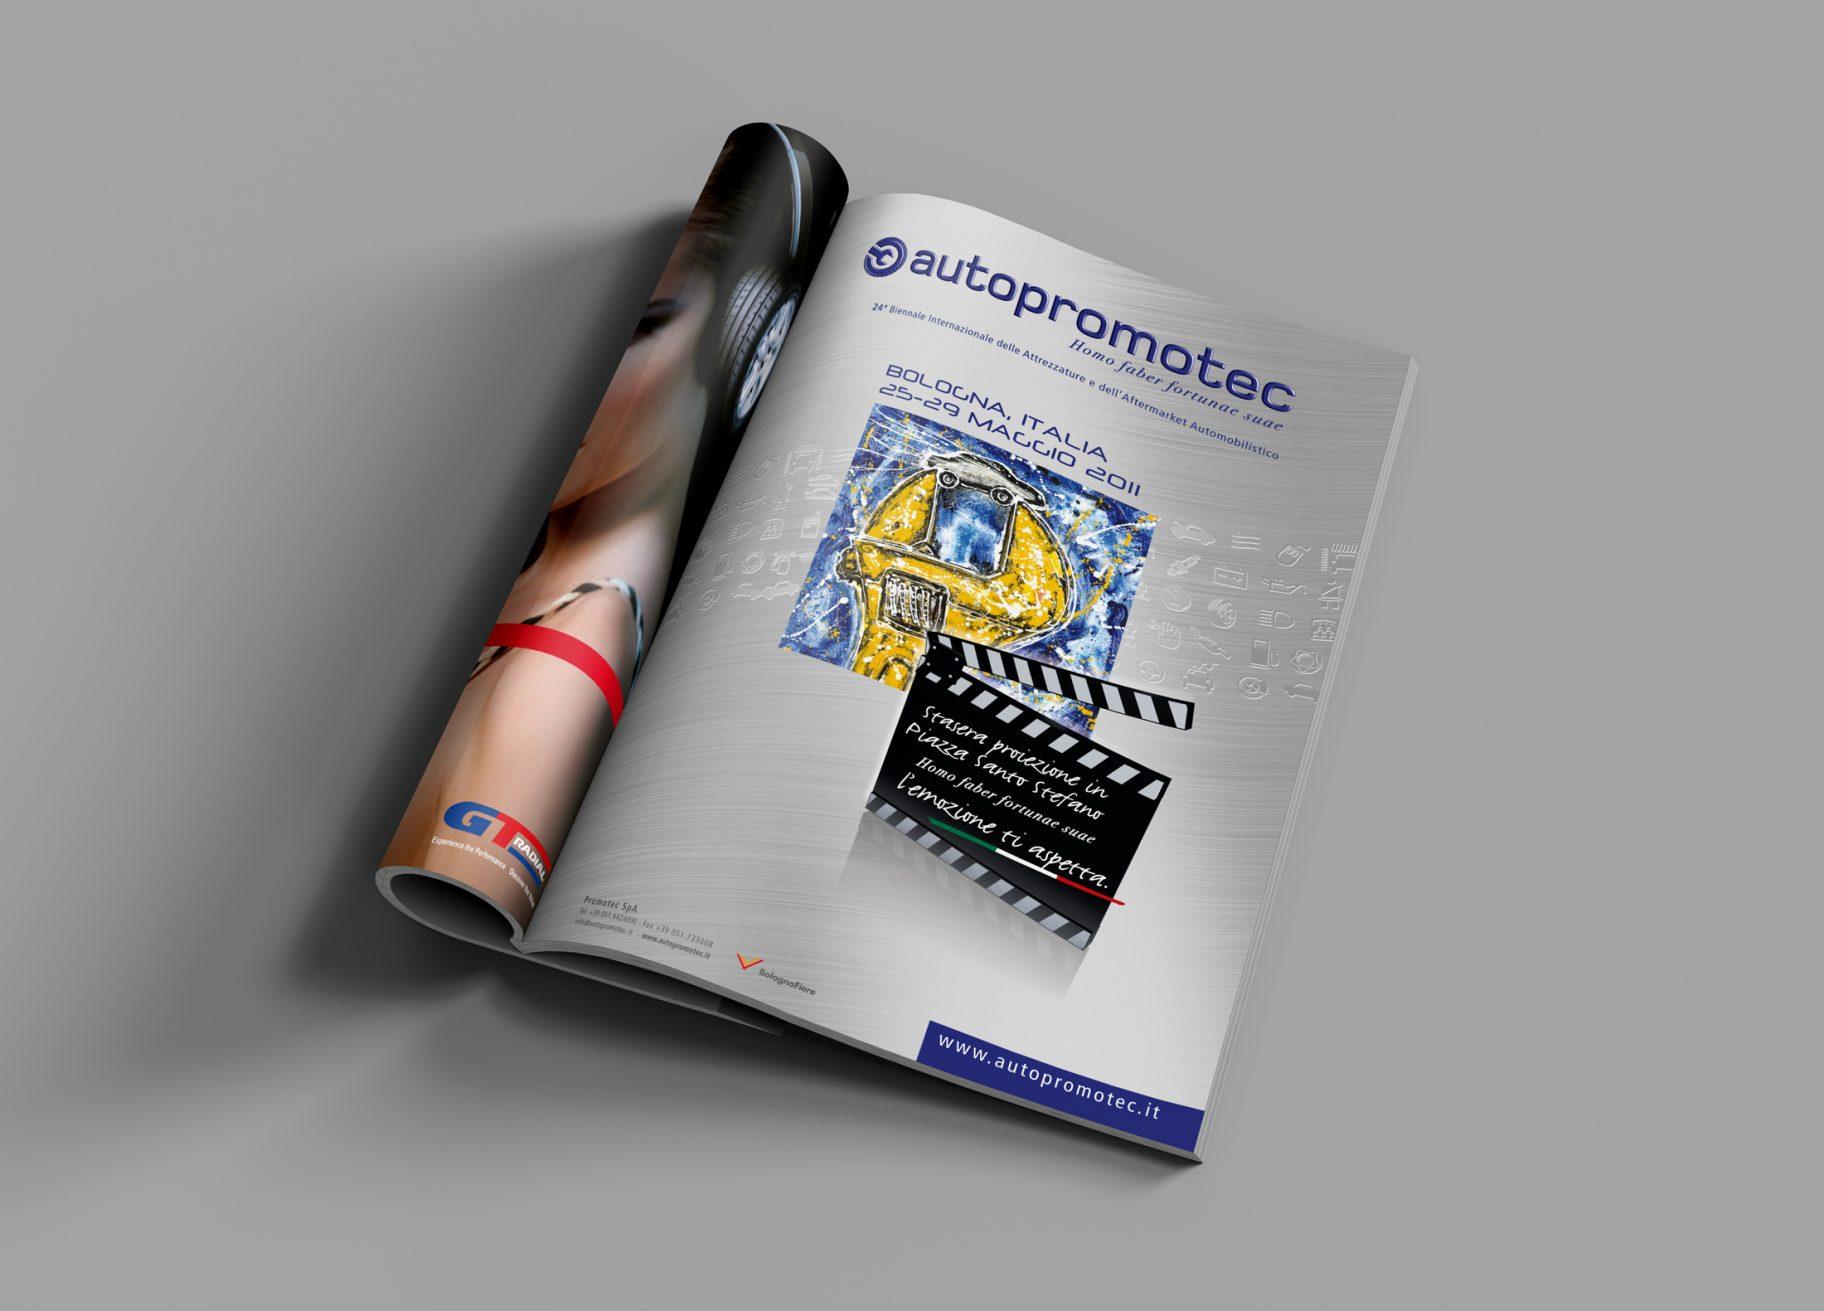 Autopromotec-fiera-2011-pagina pubblicitaria